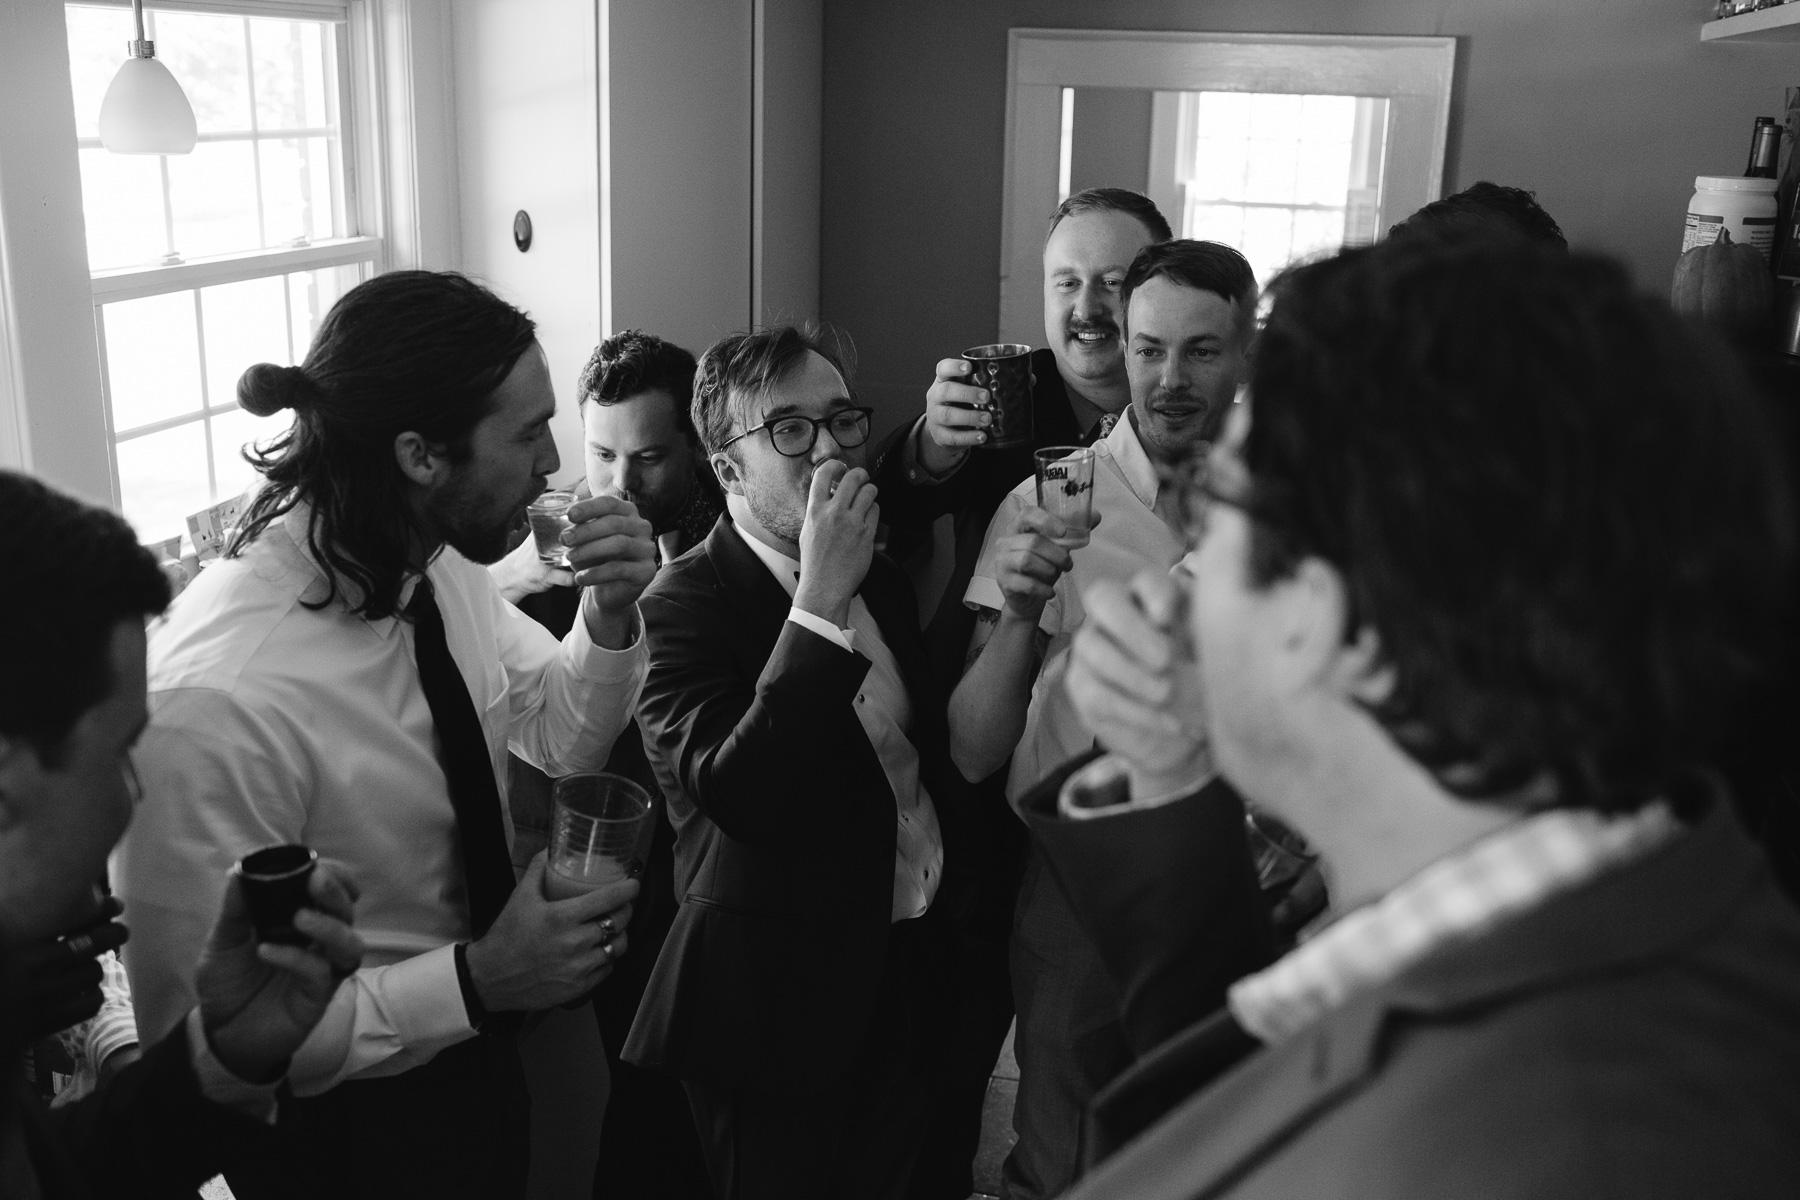 enowen-wedding-photography-mike-anna-suffolk-punch-charlotte (16 of 78).jpg